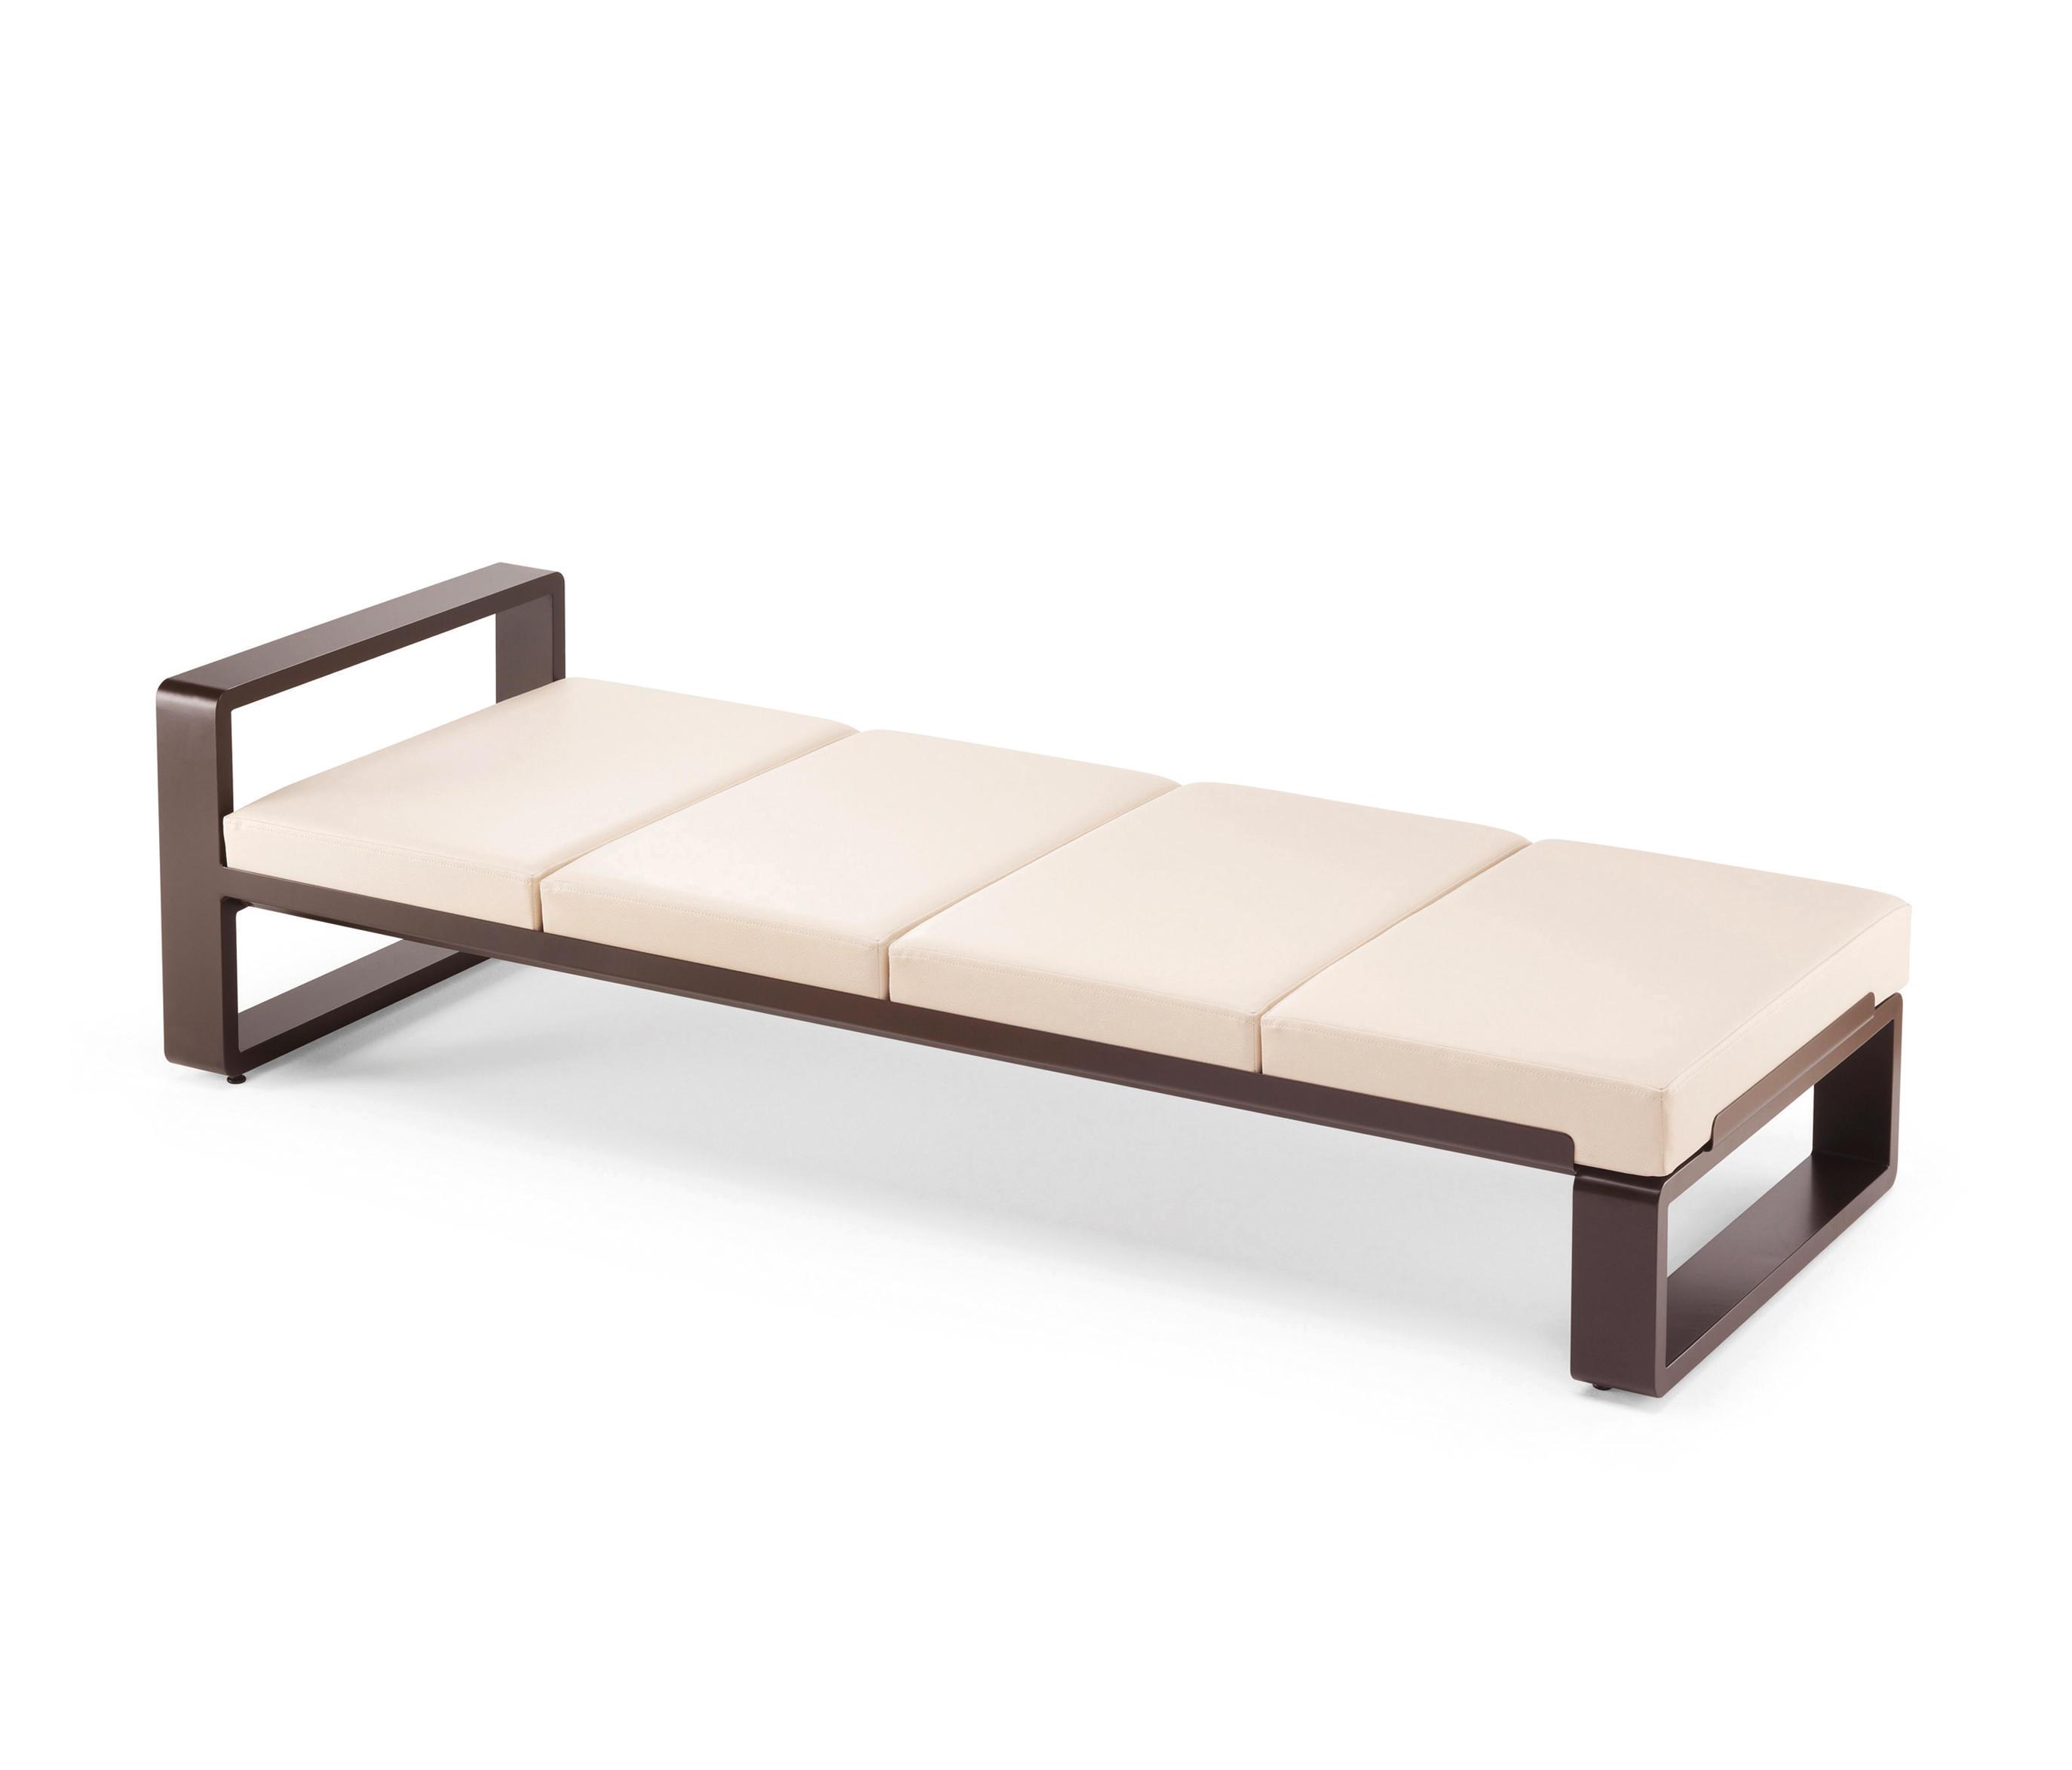 kama modular dyvan gartensofas von ego paris architonic. Black Bedroom Furniture Sets. Home Design Ideas